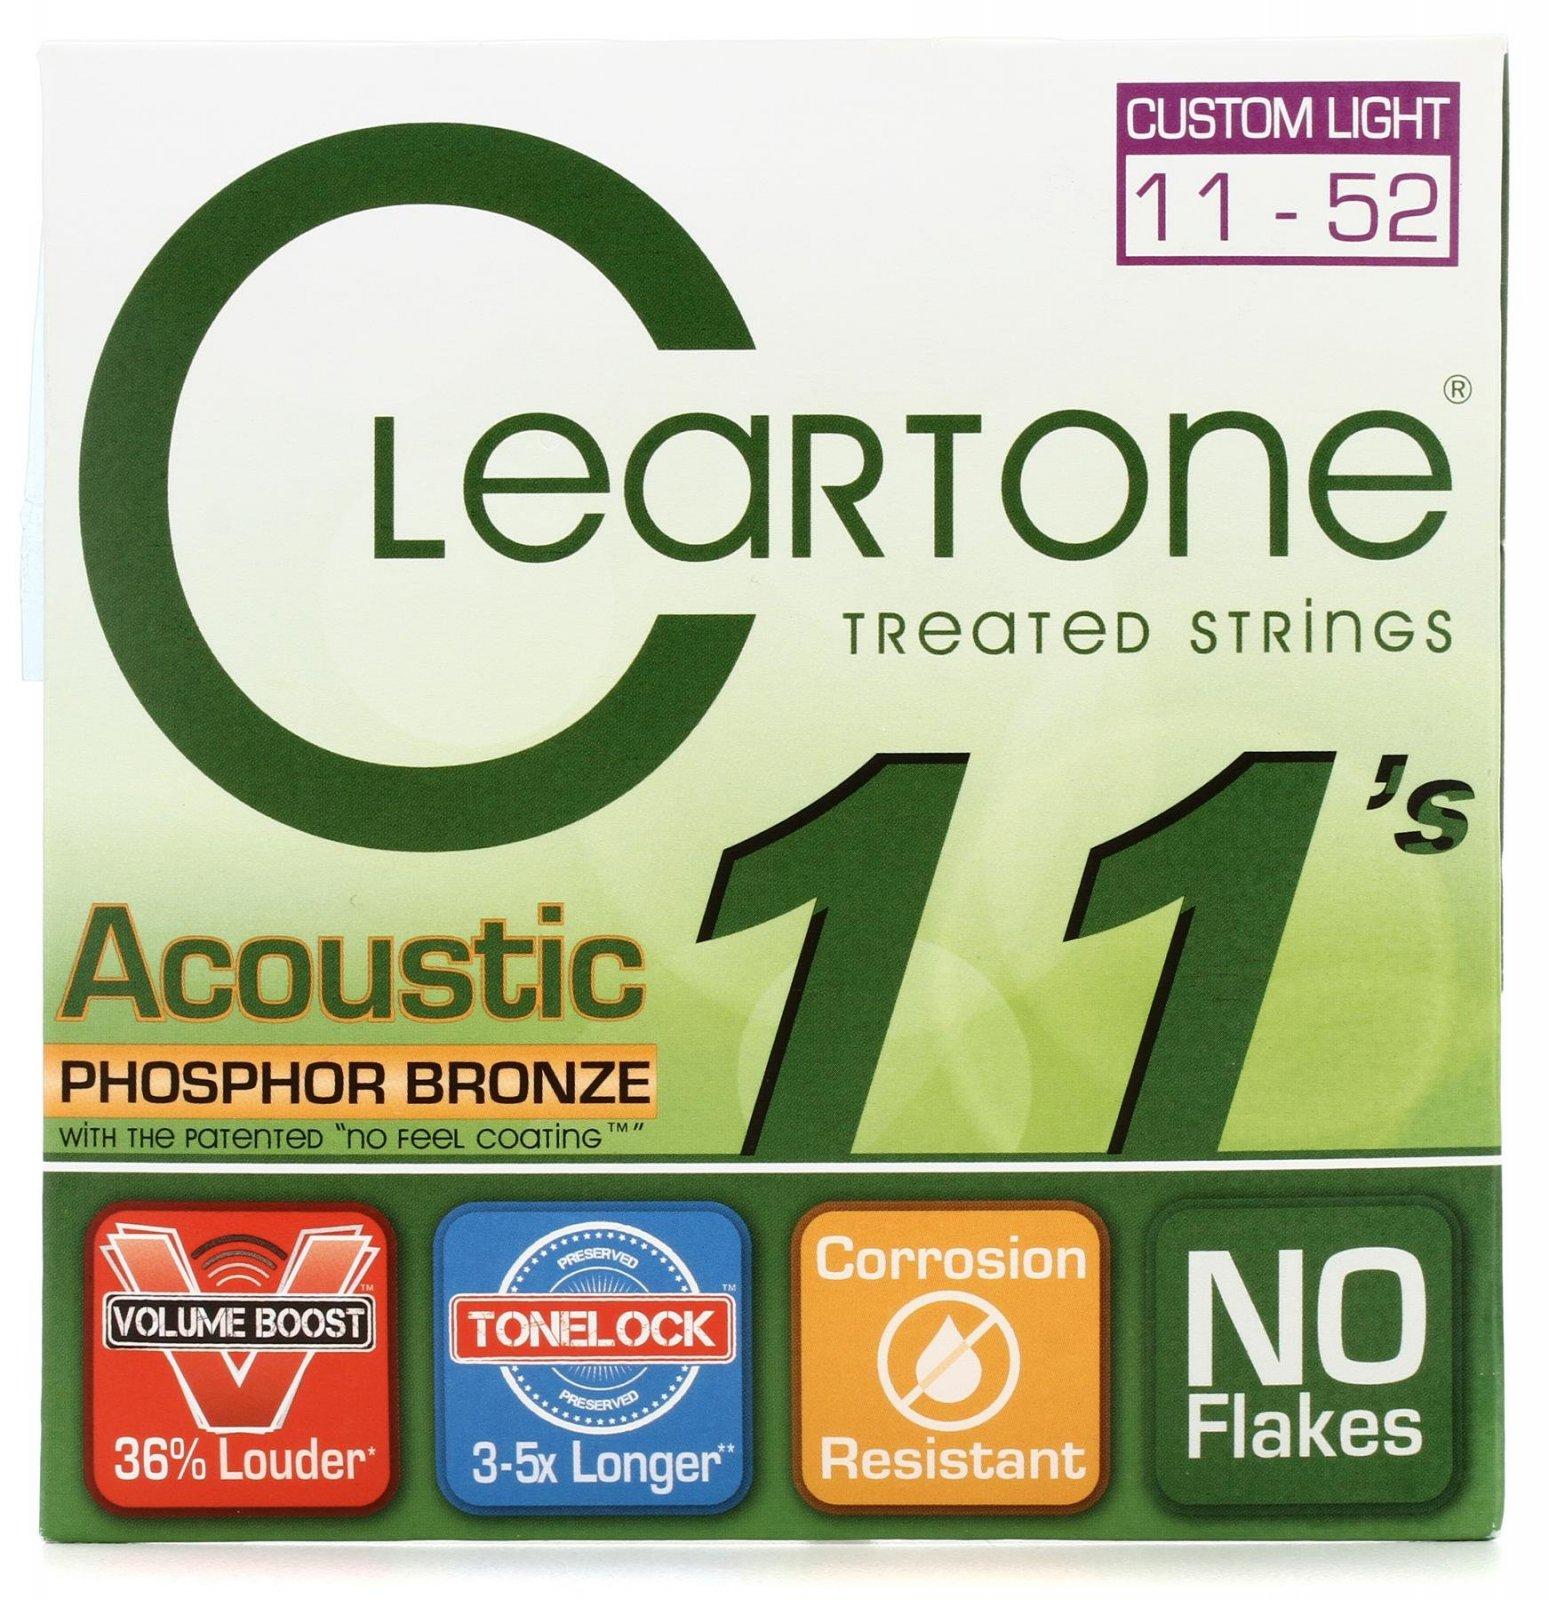 Cleartone Acoustic Treated Strings PB Cust Light